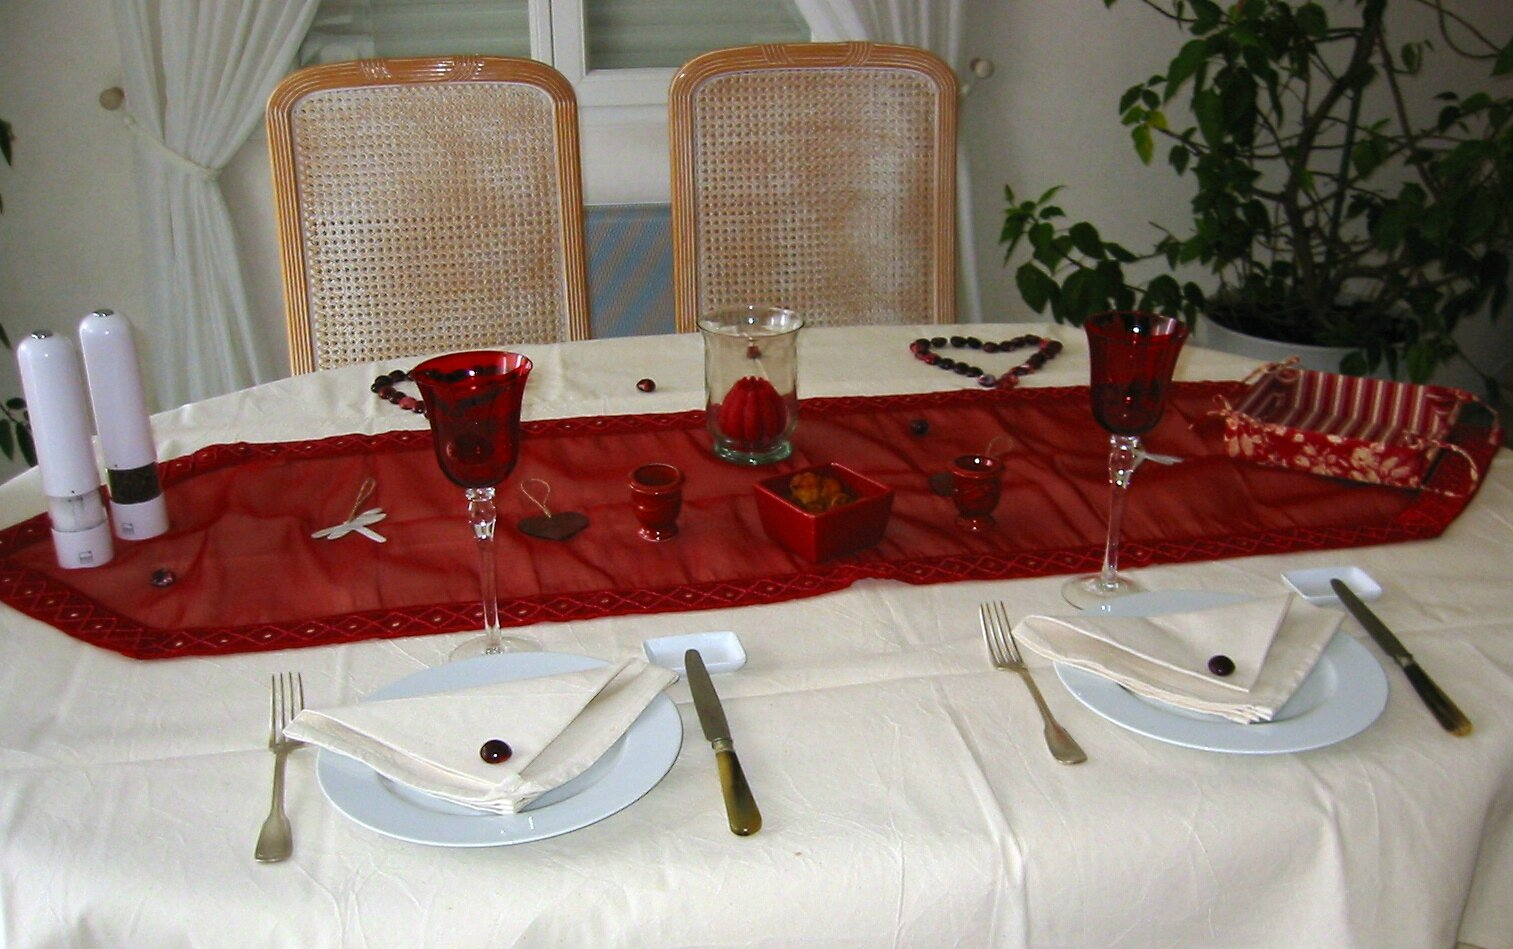 Tables de st valentin amoureux lesplatsdepat - Decoration table st valentin ...